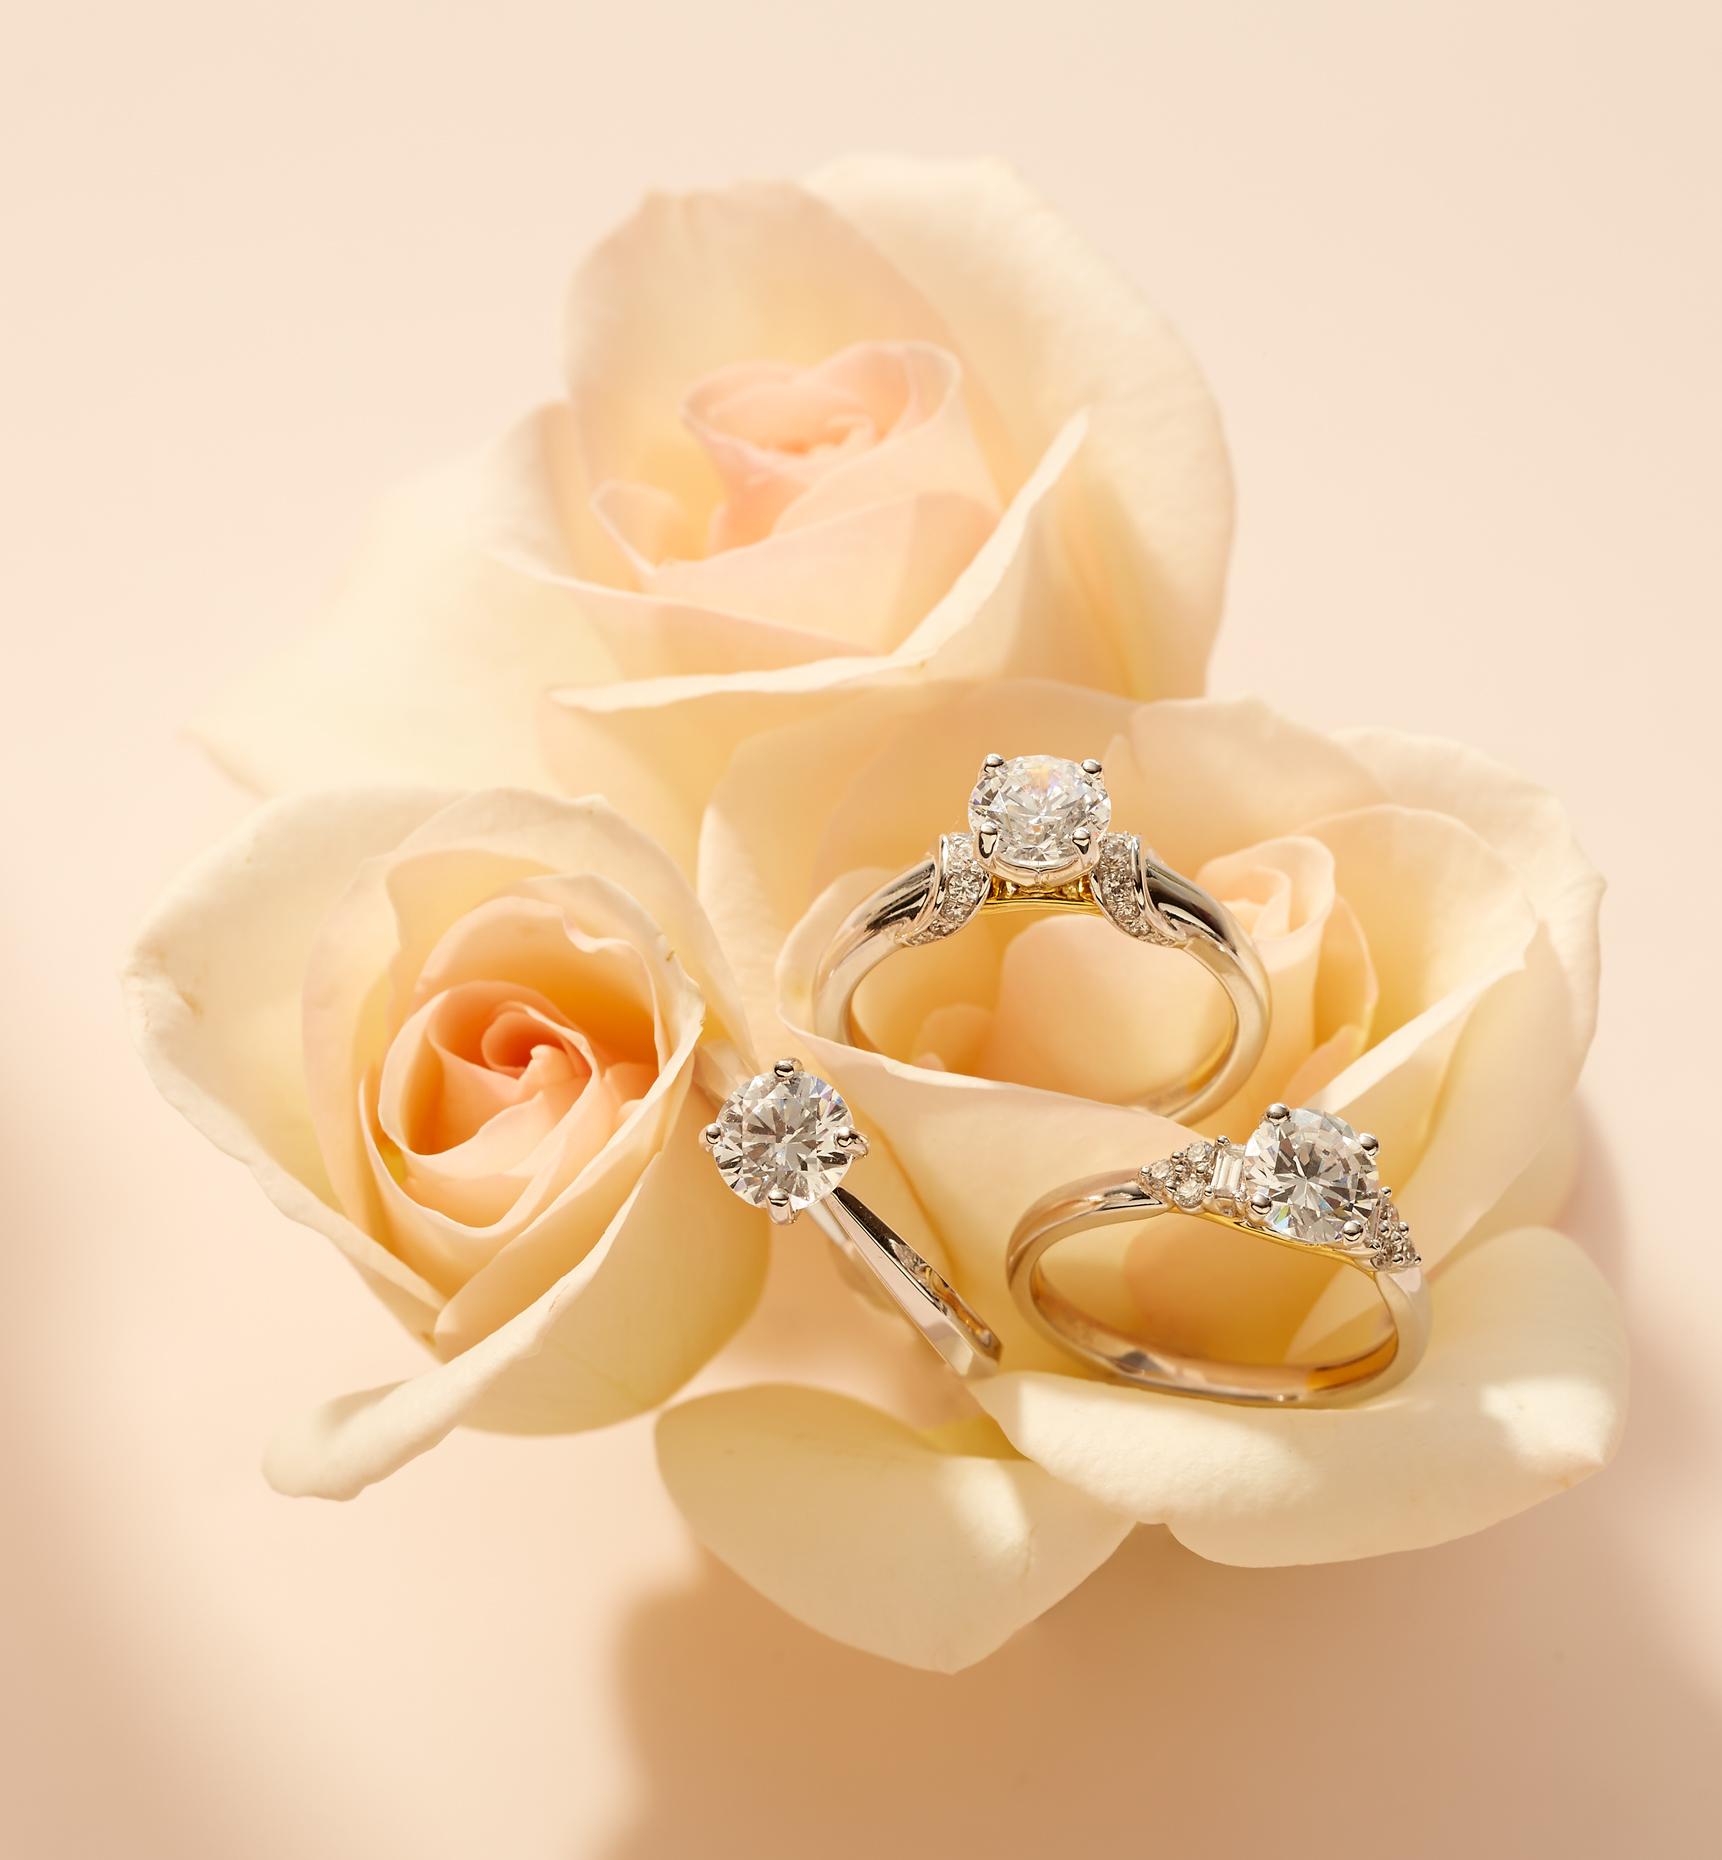 Product photography Jewelry Derek Israelsen Diamond Rings Roses